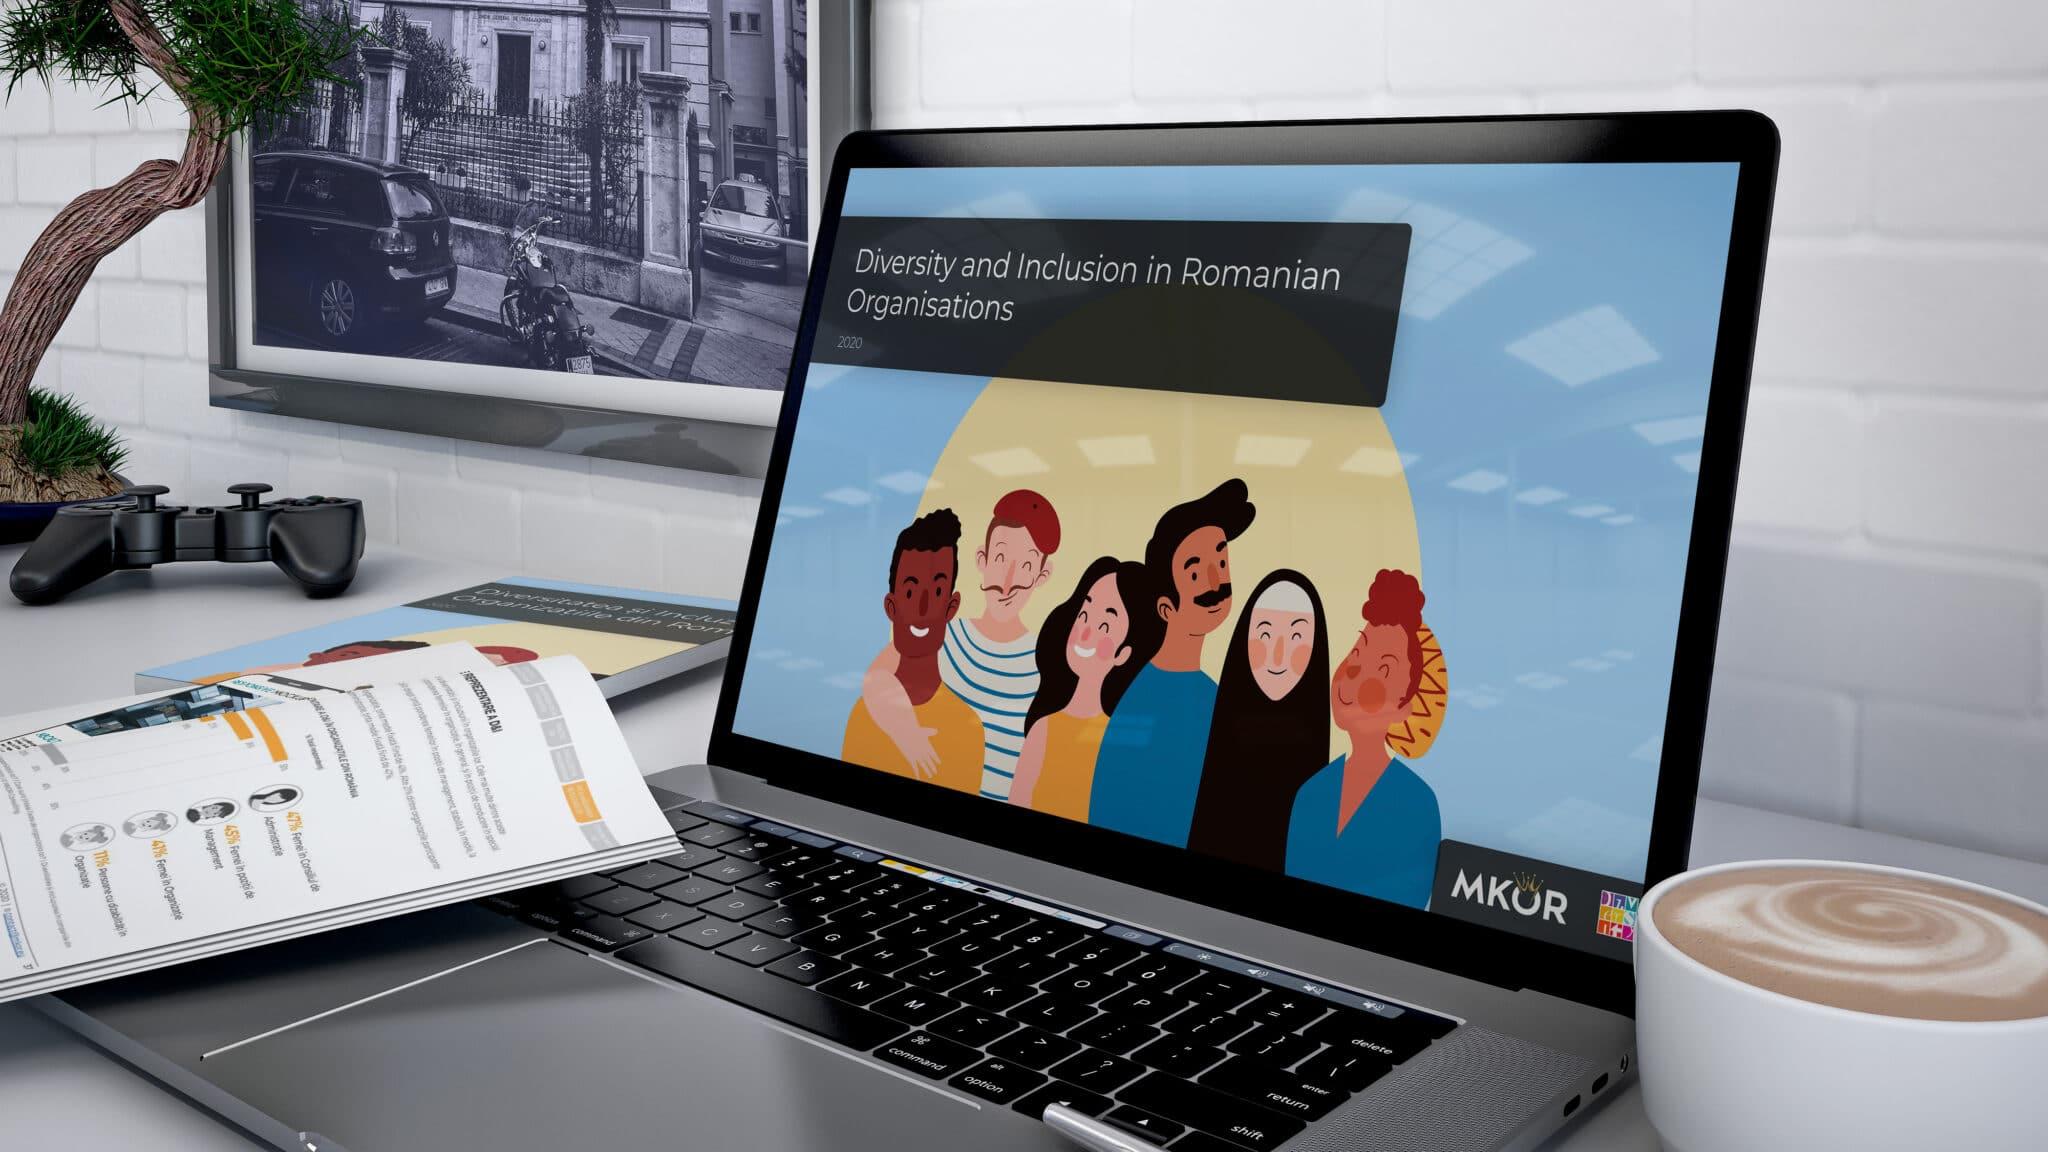 diversity-inclusion-management-report-preview